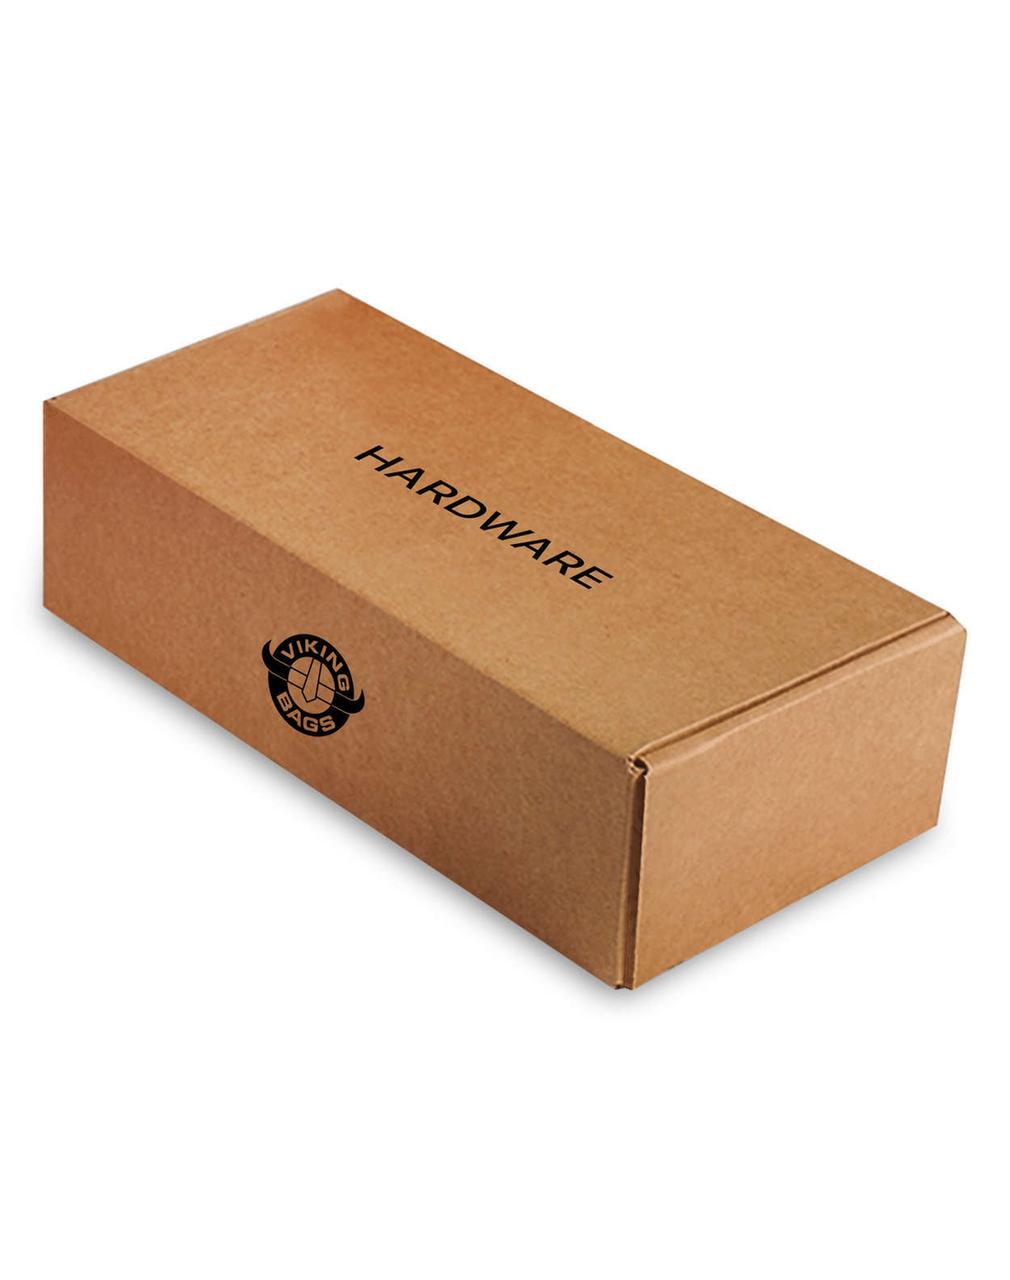 Honda 750 Shadow Phantom Small Thor Series Motorcycle Saddlebags box